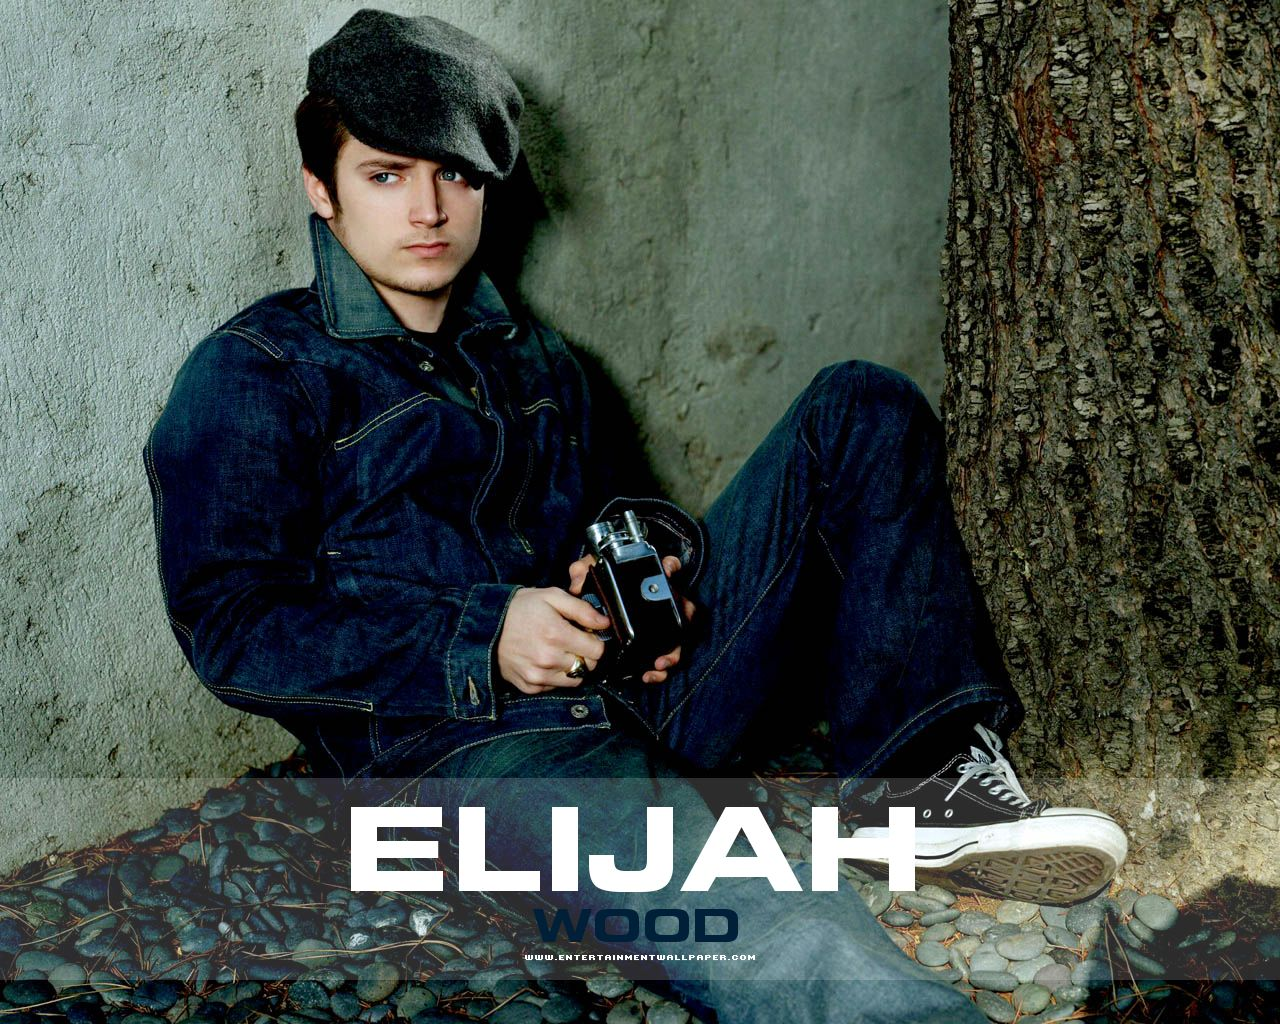 http://4.bp.blogspot.com/-LYksBd1X2OQ/TdVJfqVC0nI/AAAAAAAAAF4/rGPGC5zBiOA/s1600/091027040615_Elijah-Wood.jpg